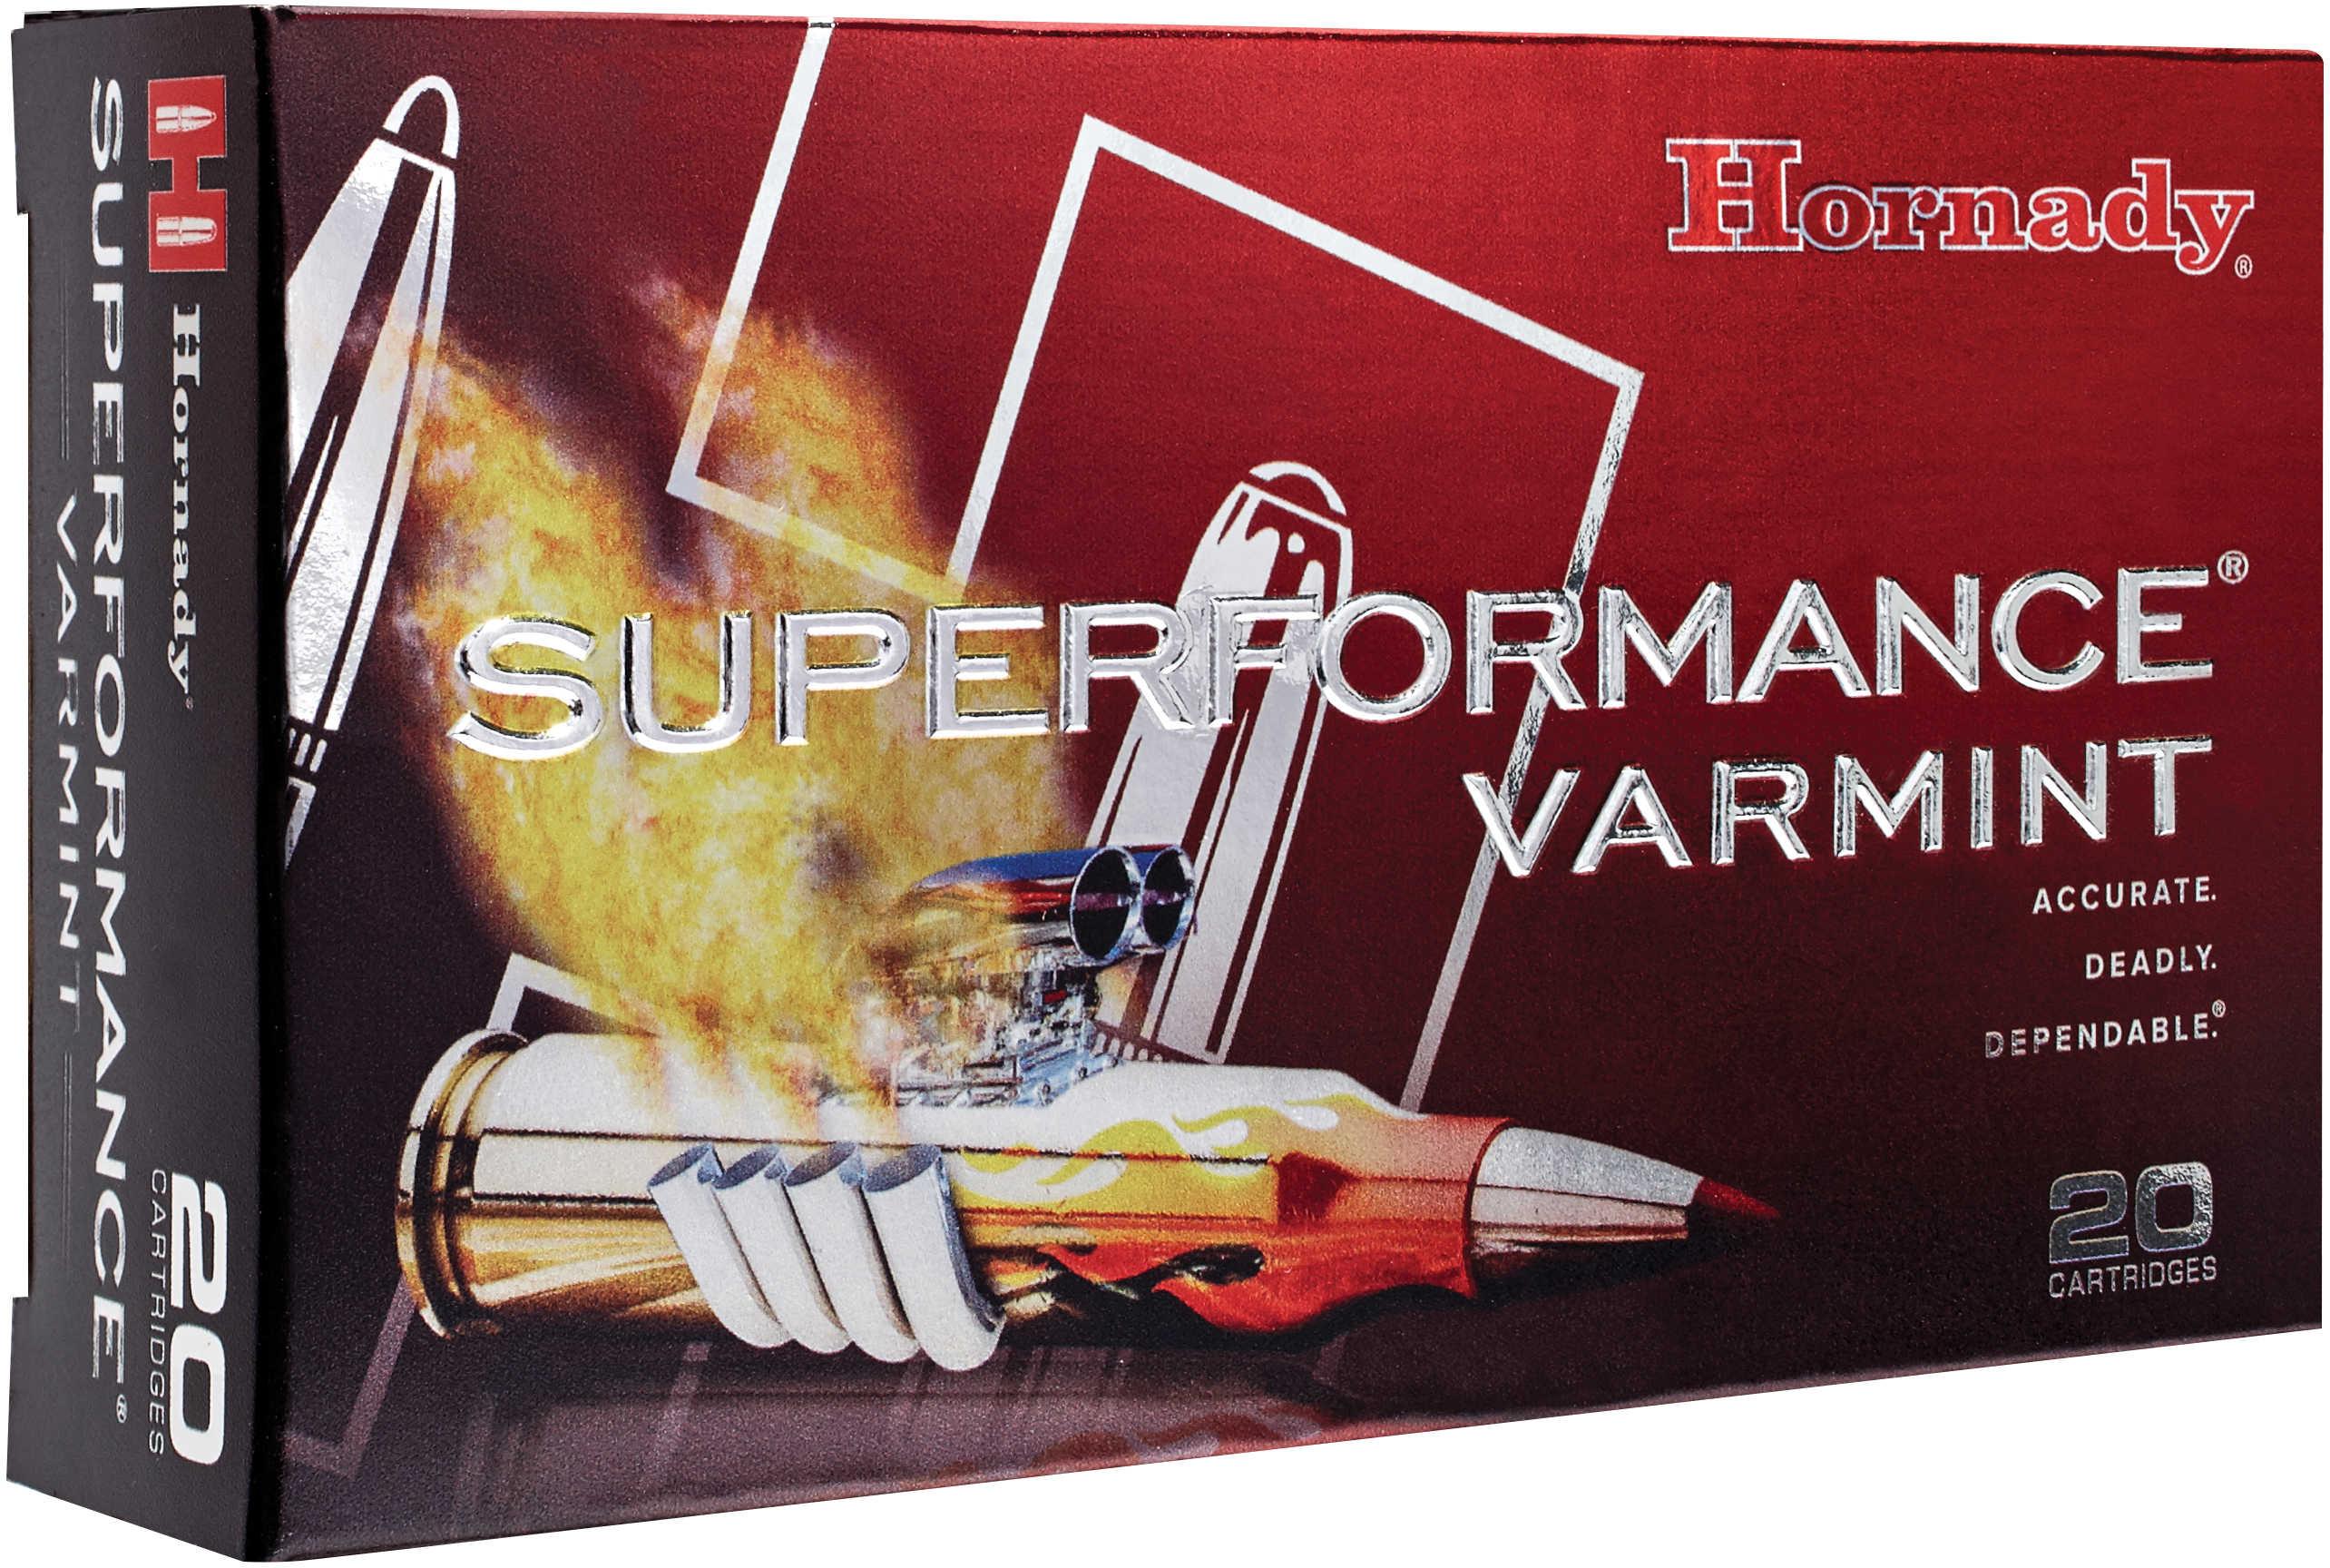 Hornady 222 Remington Ammunition Superformance Varmint, 35 Gr, NTX/20 8309